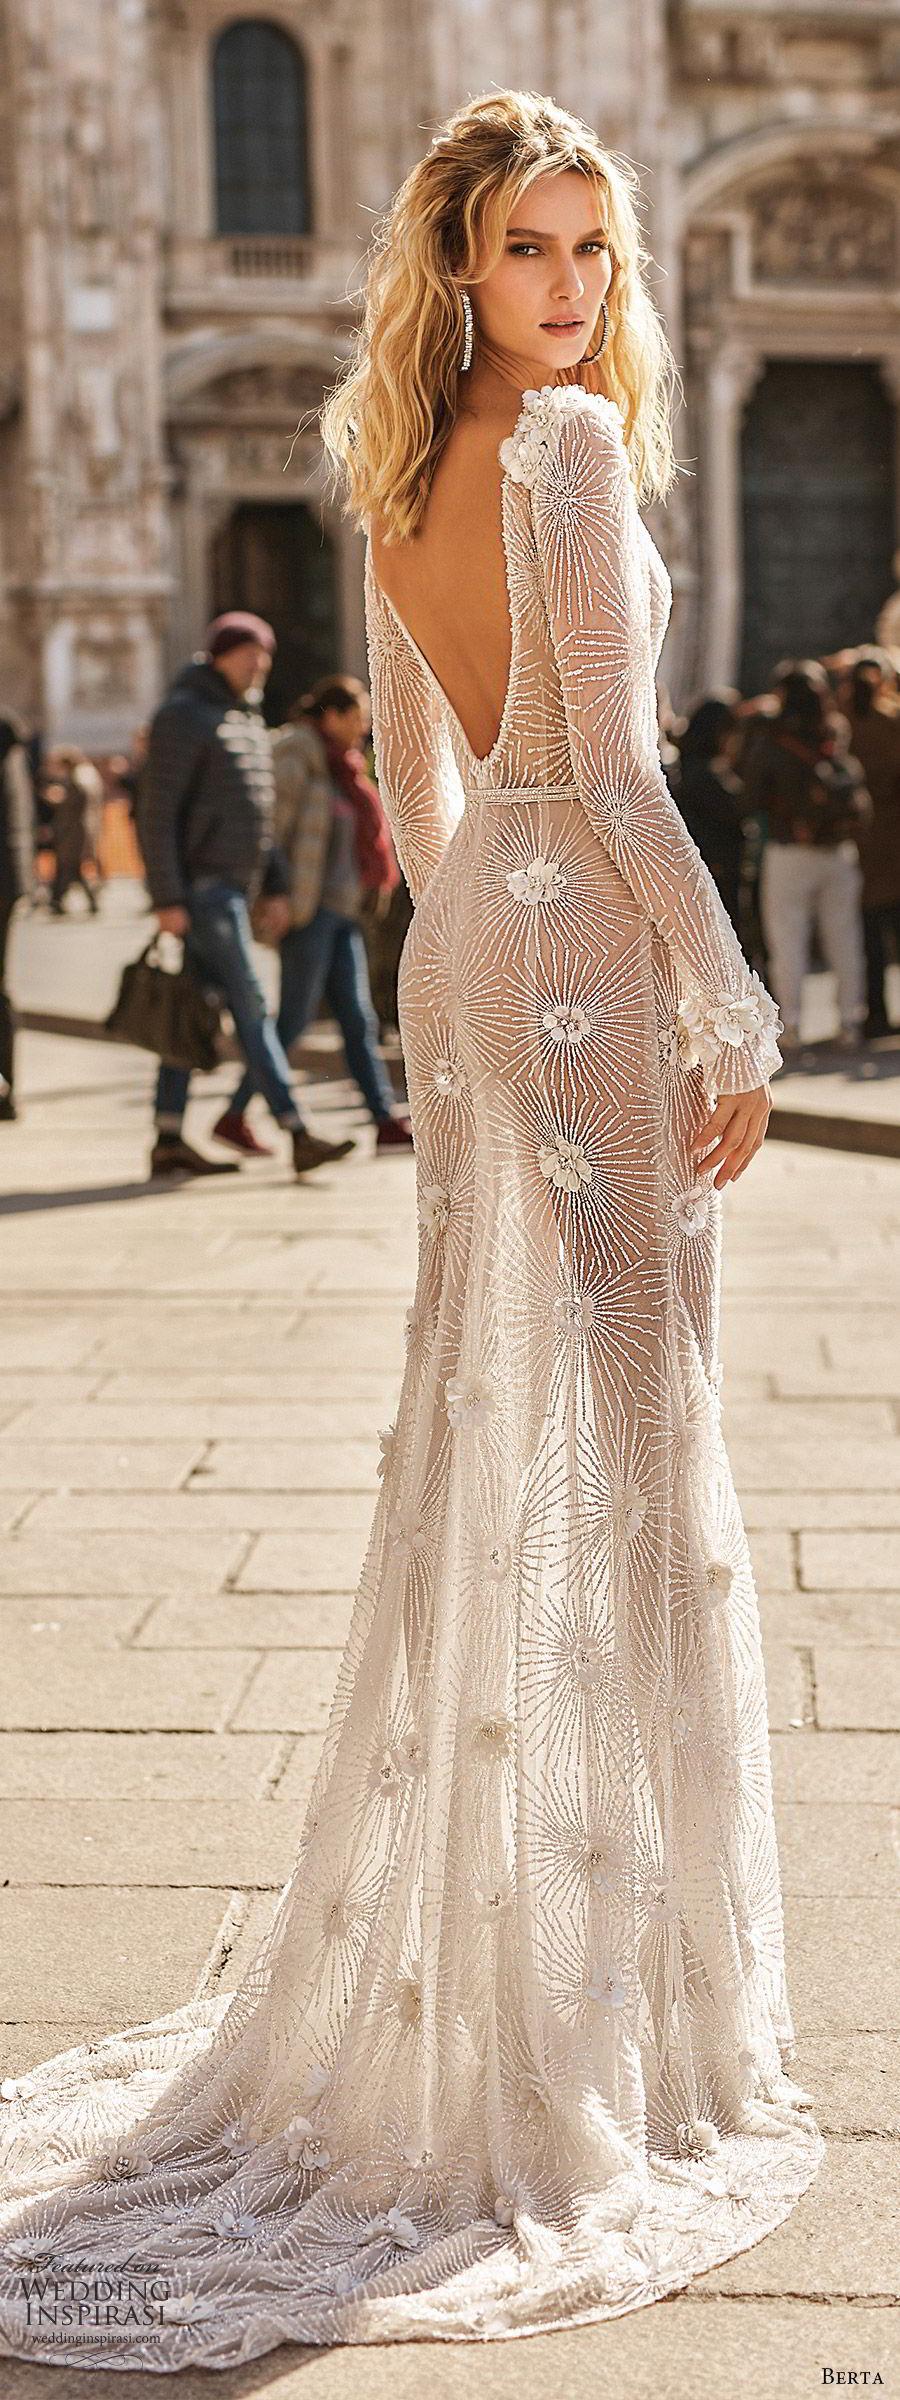 berta spring 2020 bridal illusion long sleeves deep v neckline fully embellished sheath wedding dress (12) sheer skirt chapel train glitzy glam bv